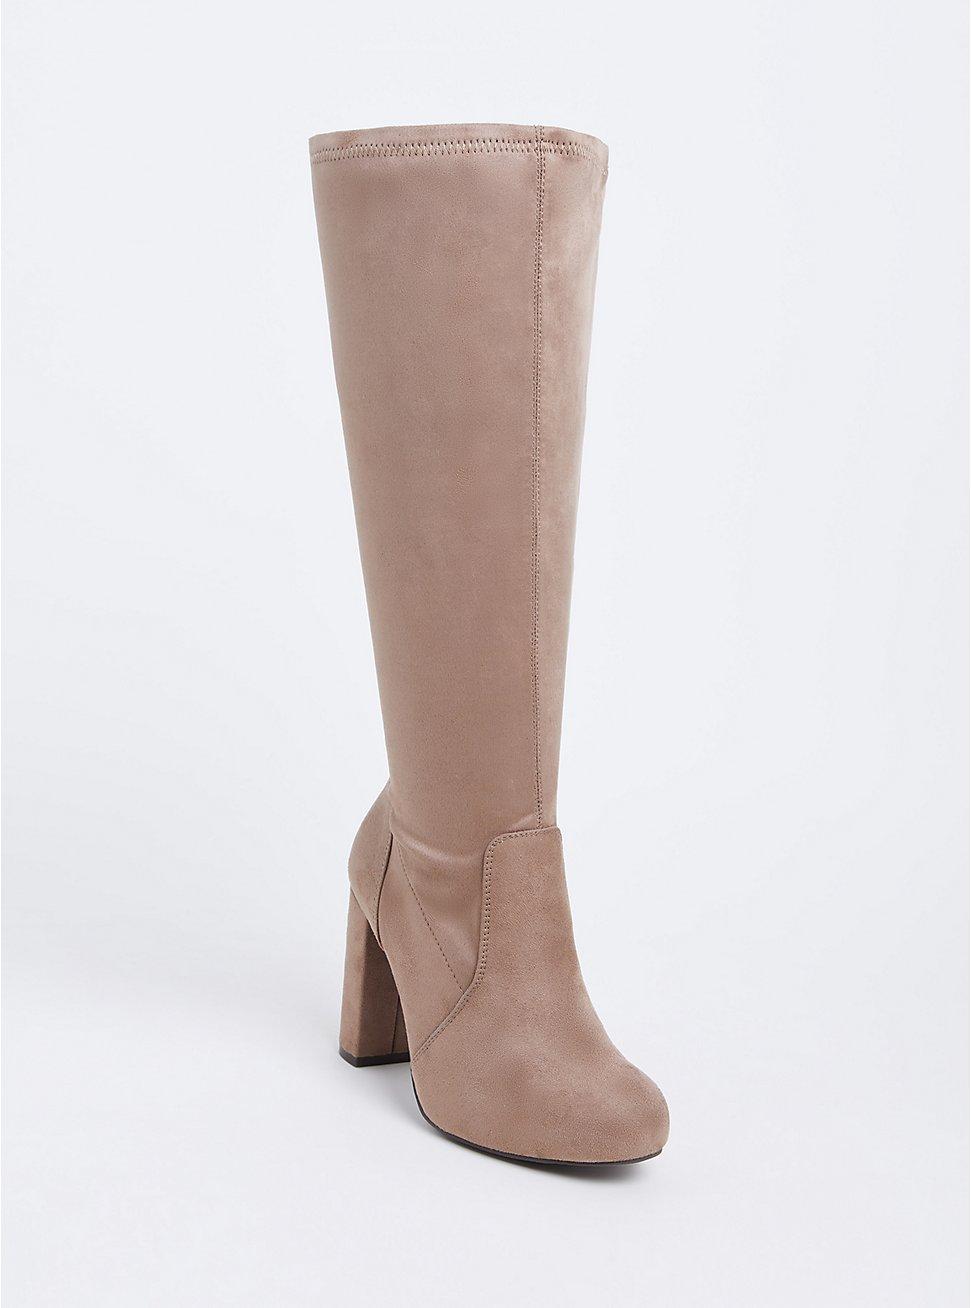 Tan Faux Suede Barrel Knee-High Boot (WW), TAN/BEIGE, hi-res